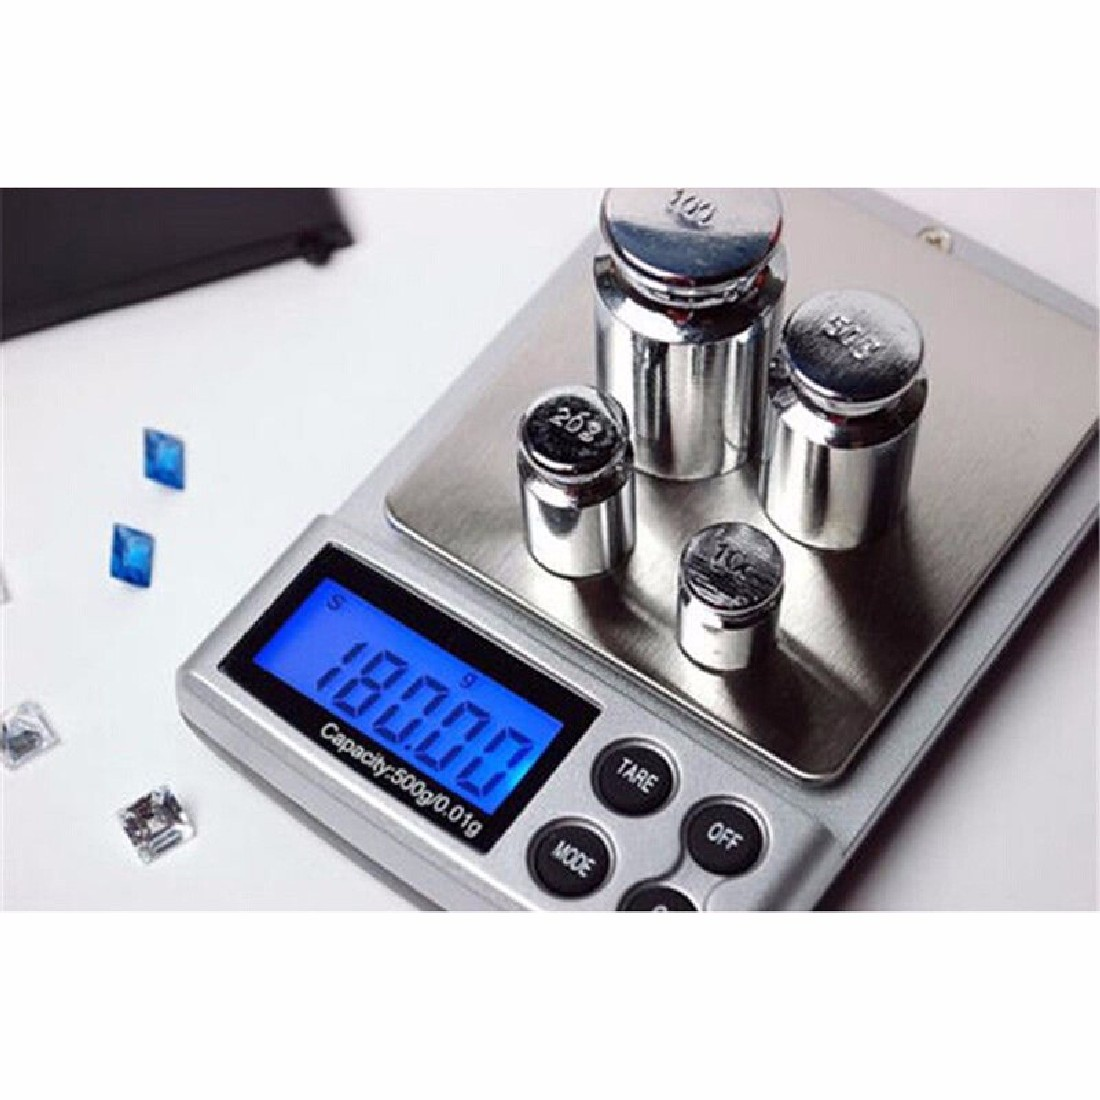 1pc 500g x 0.01g Escala de precisión digital Oro Plata Joyería - Instrumentos de medición - foto 6